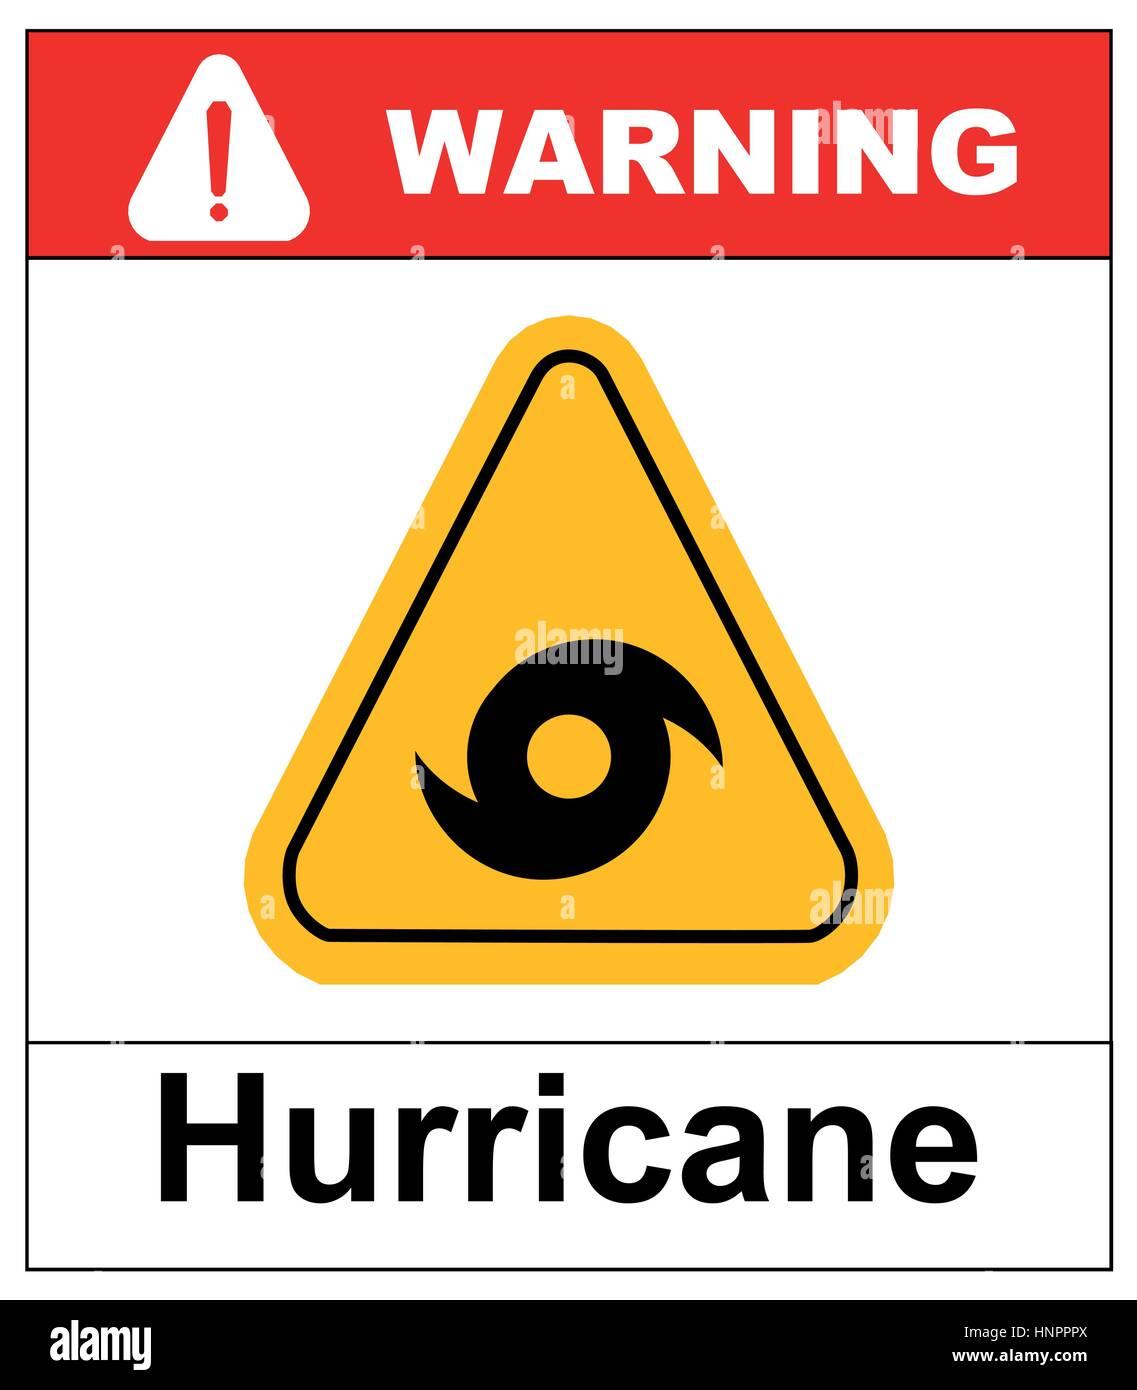 Hurricane Warning issued, state of emergency declared, evacuation ...